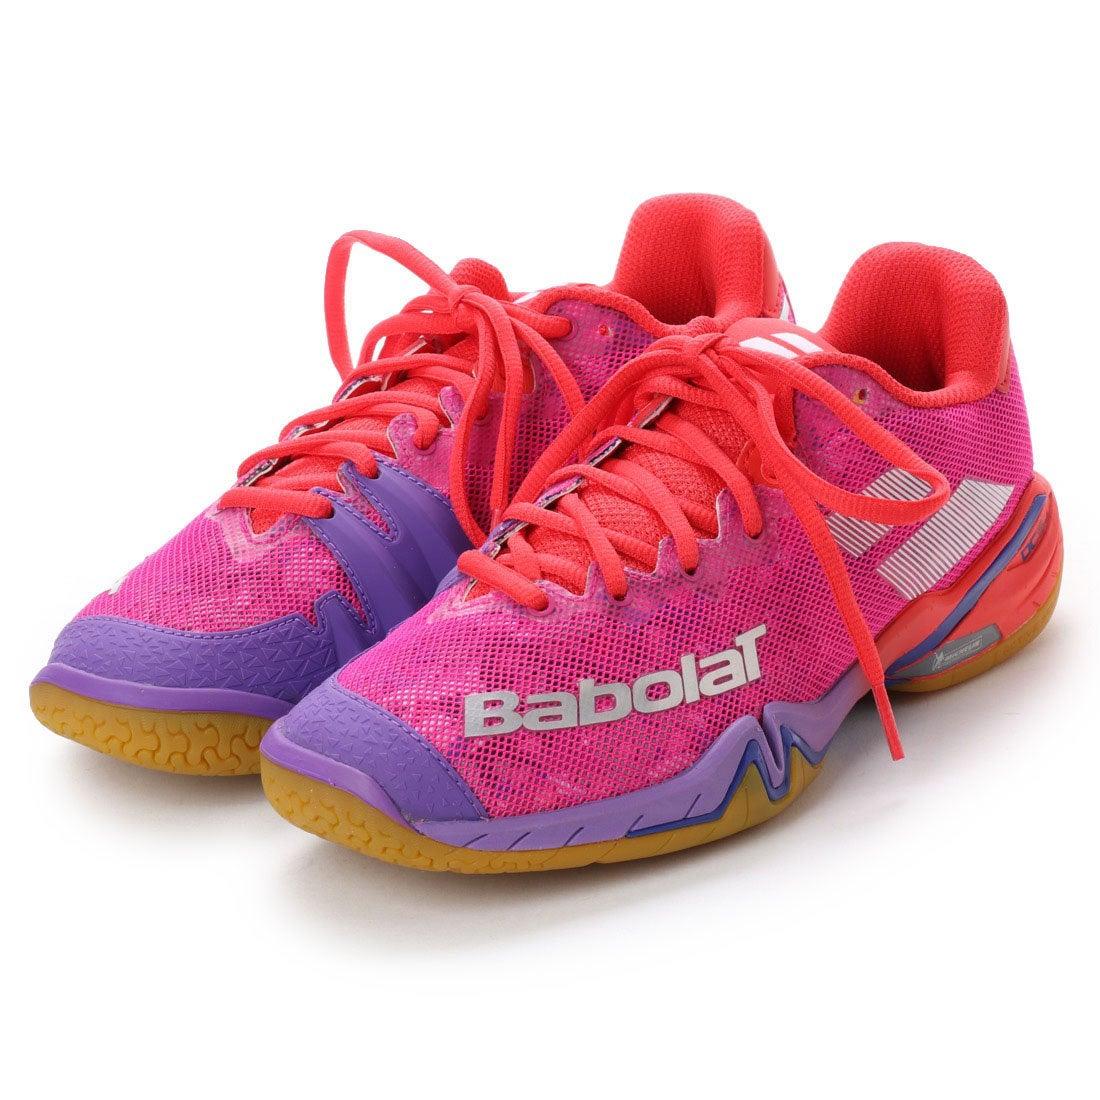 【SALE 10%OFF】バボラ Babolat レディース バドミントン シューズ シャドウツアー BASF1802